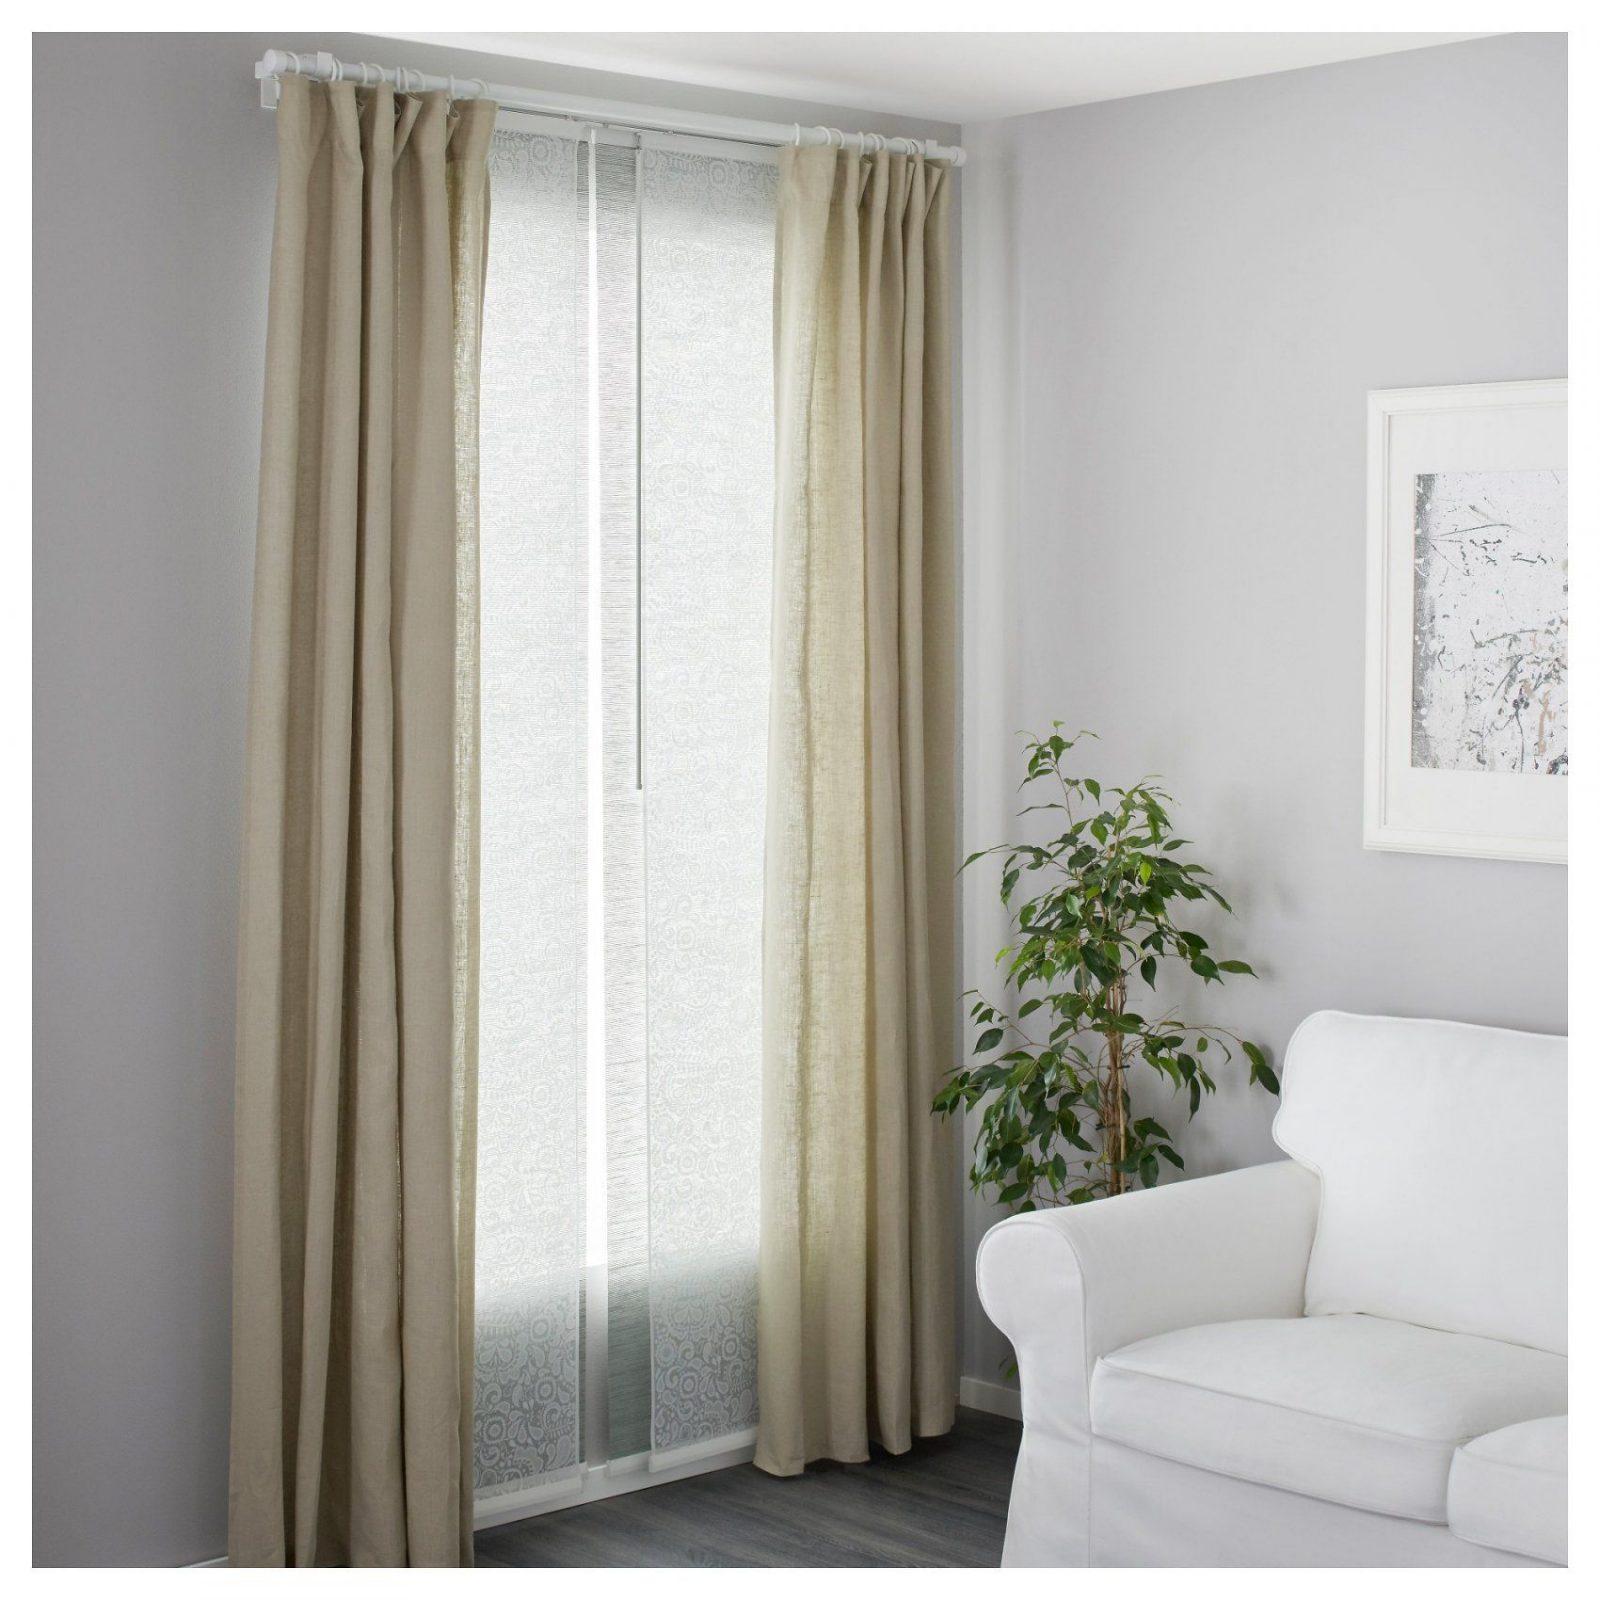 ikea gardinen aufh ngen haus design ideen. Black Bedroom Furniture Sets. Home Design Ideas